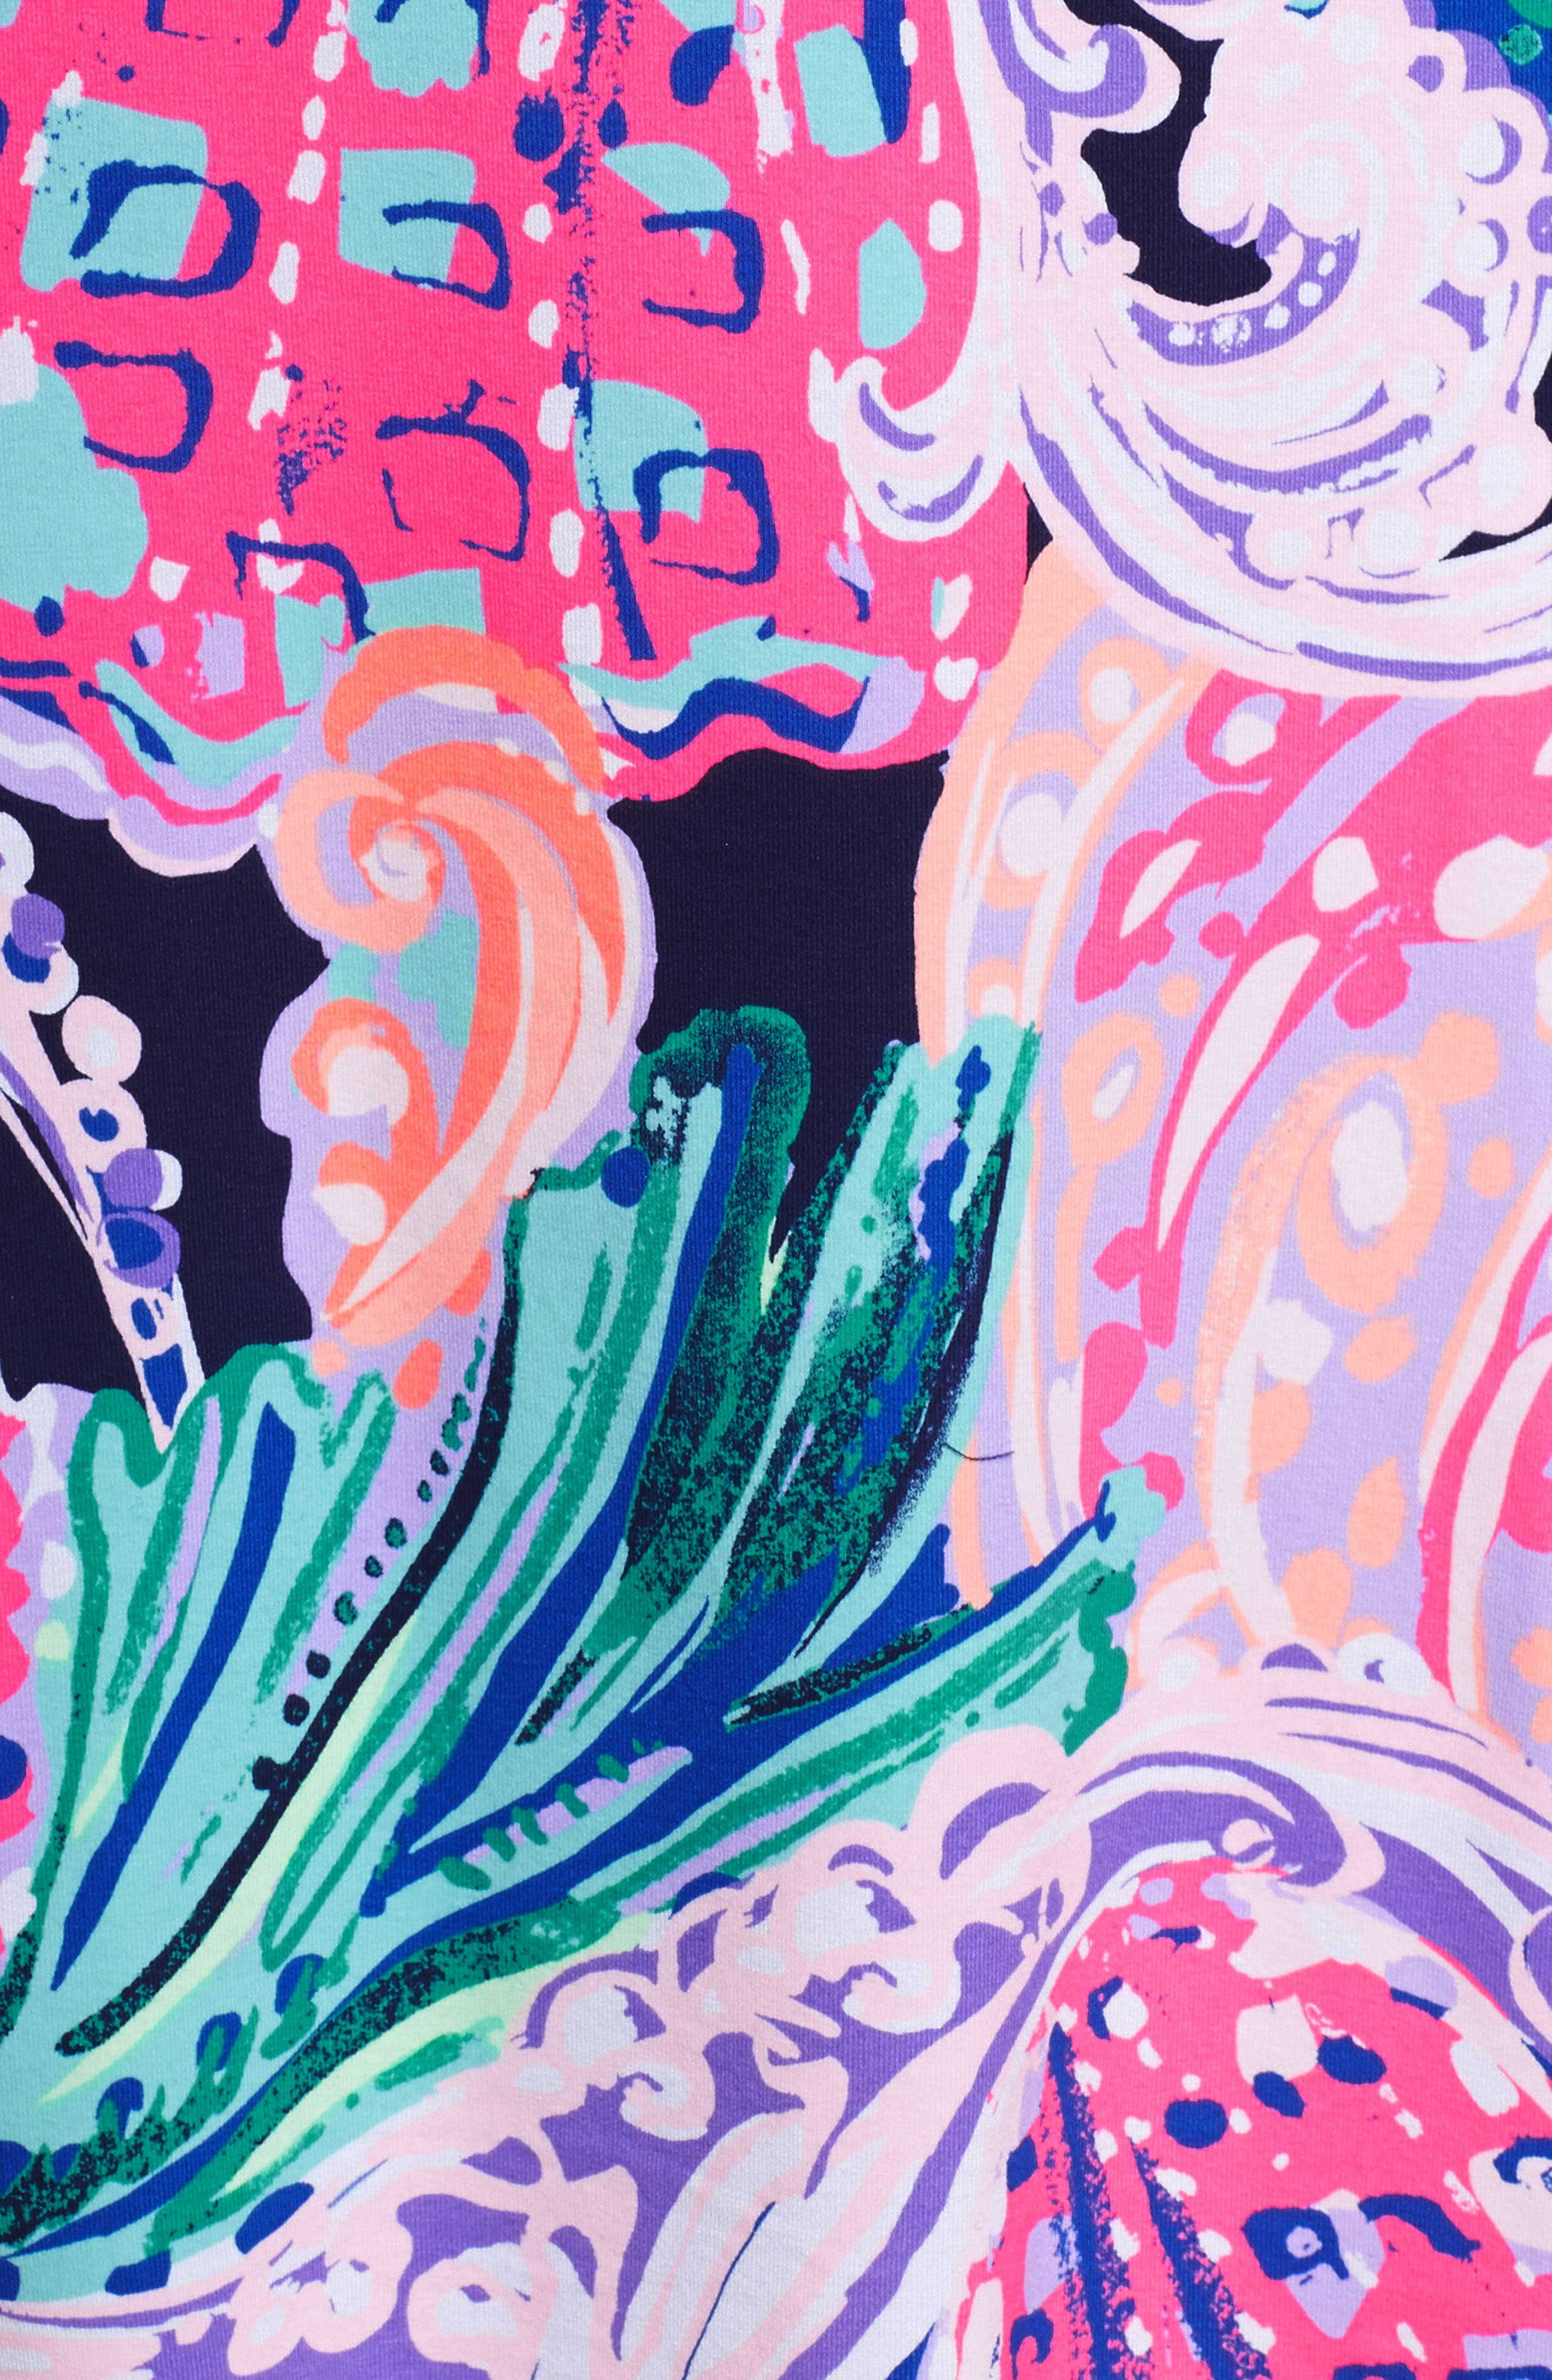 Trisha Off the Shoulder Dress,                             Alternate thumbnail 6, color,                             599